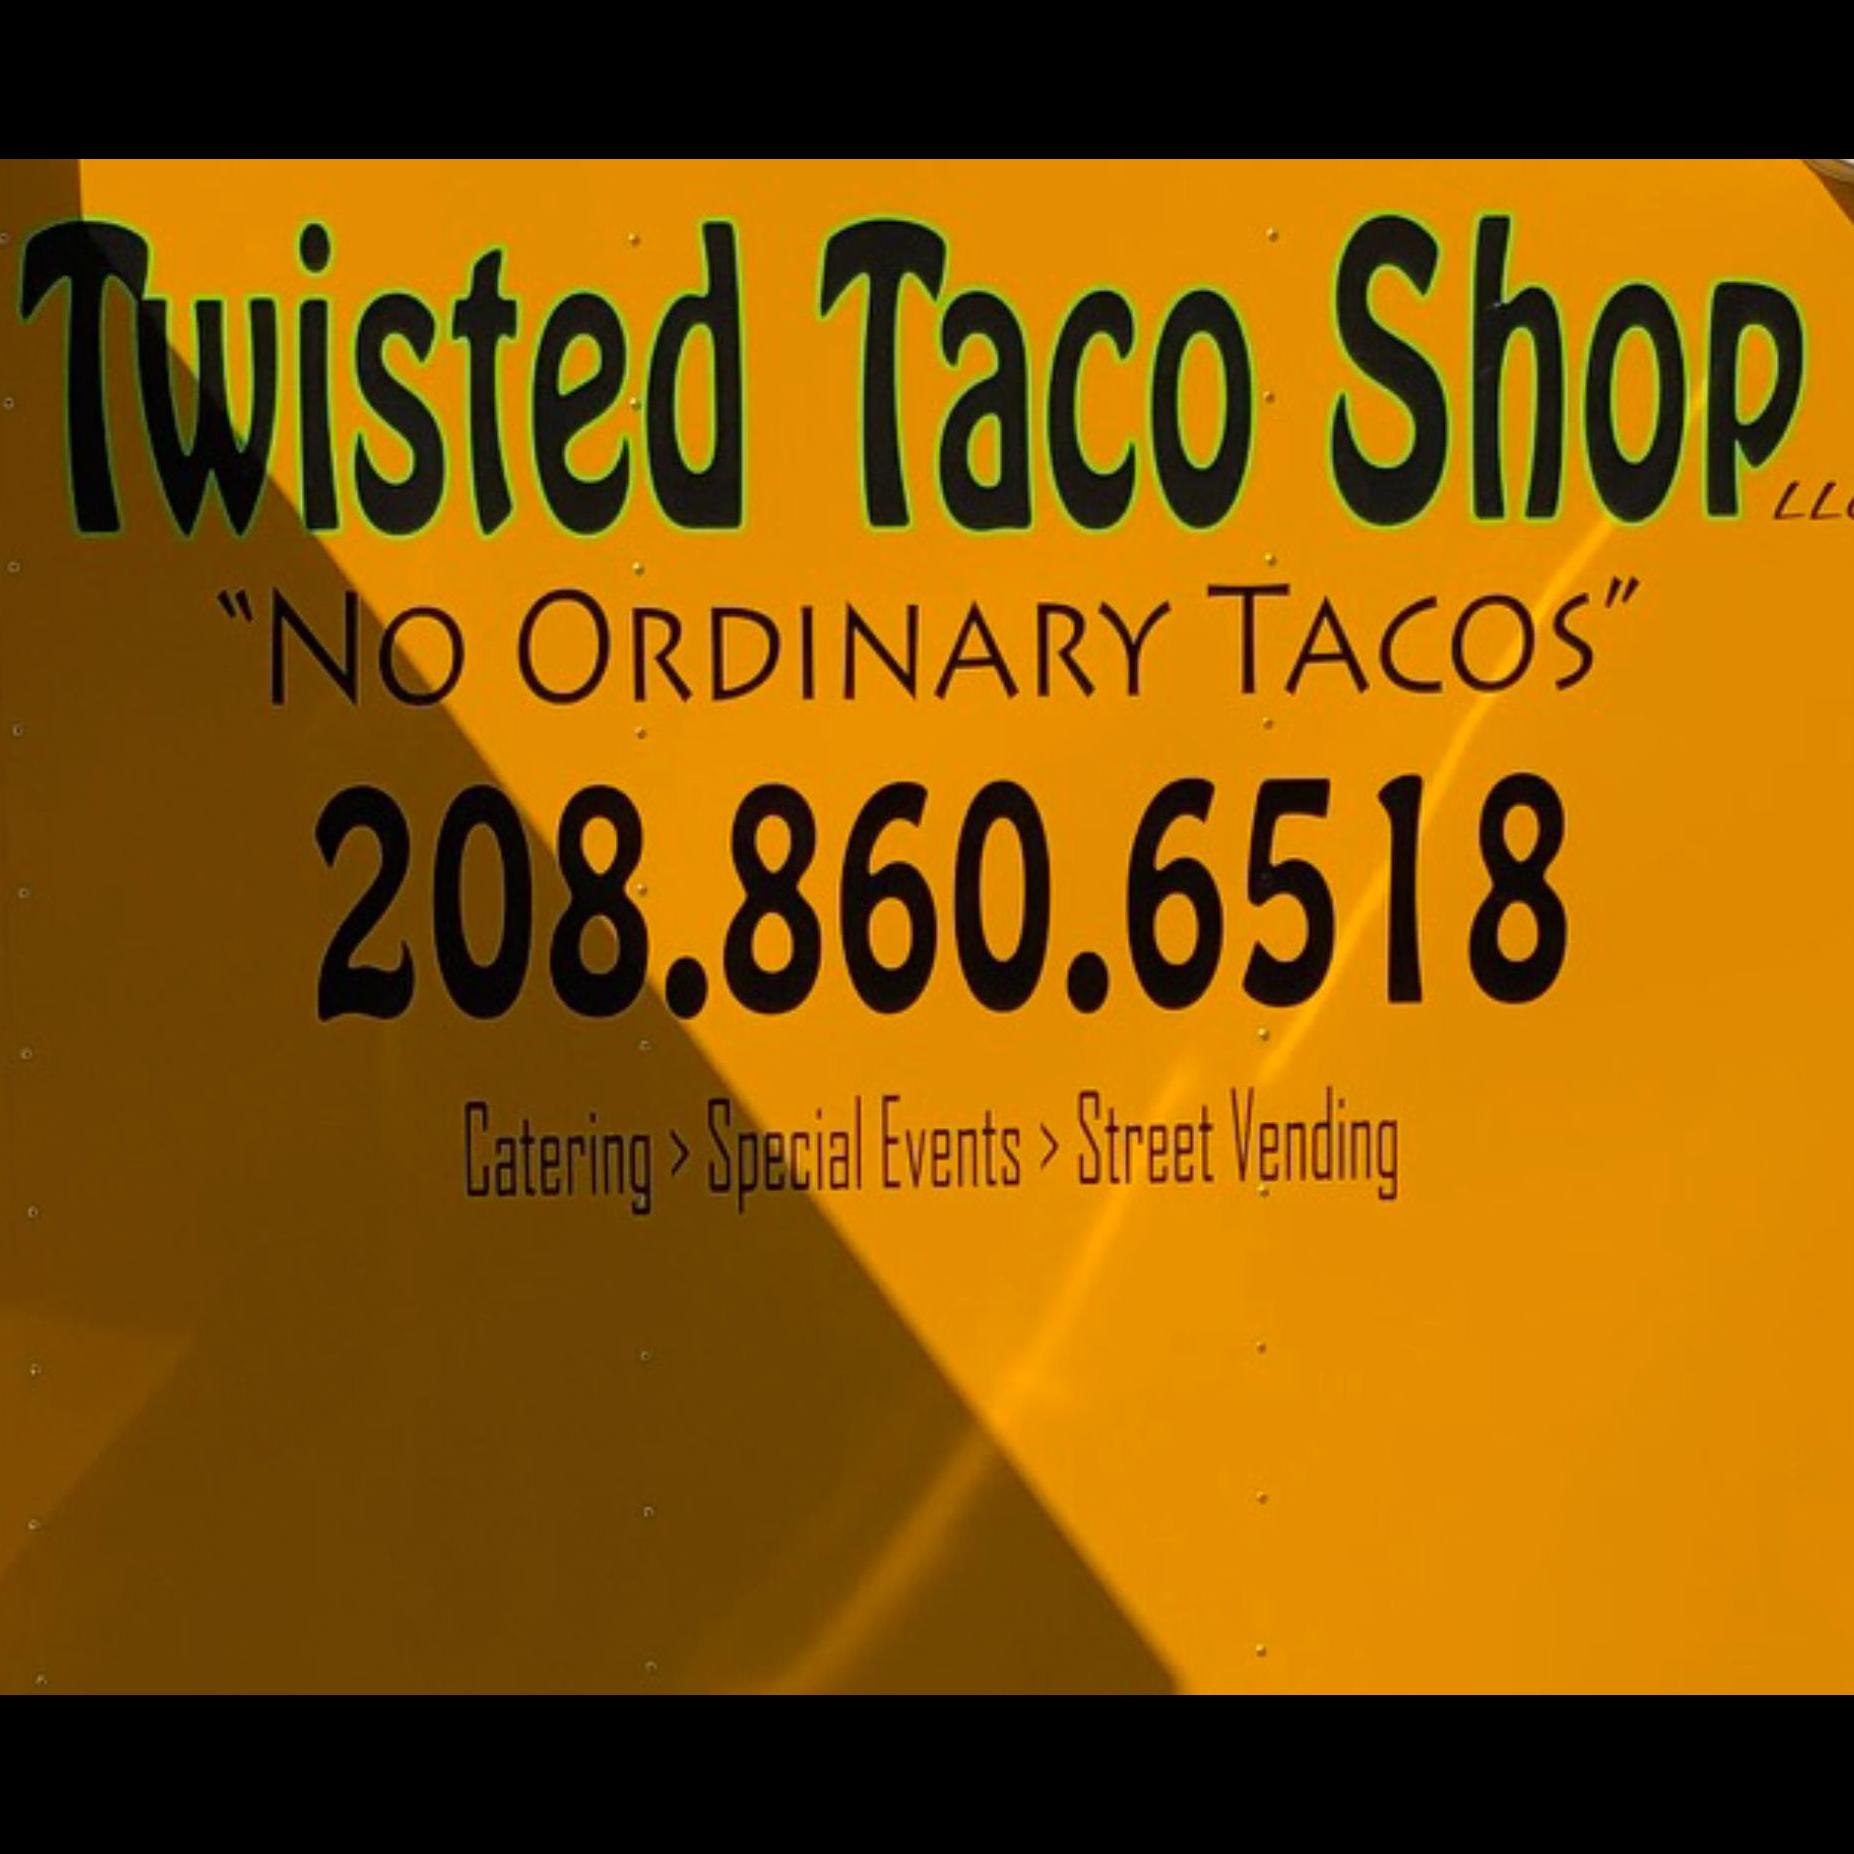 Twisted Taco Shop logo